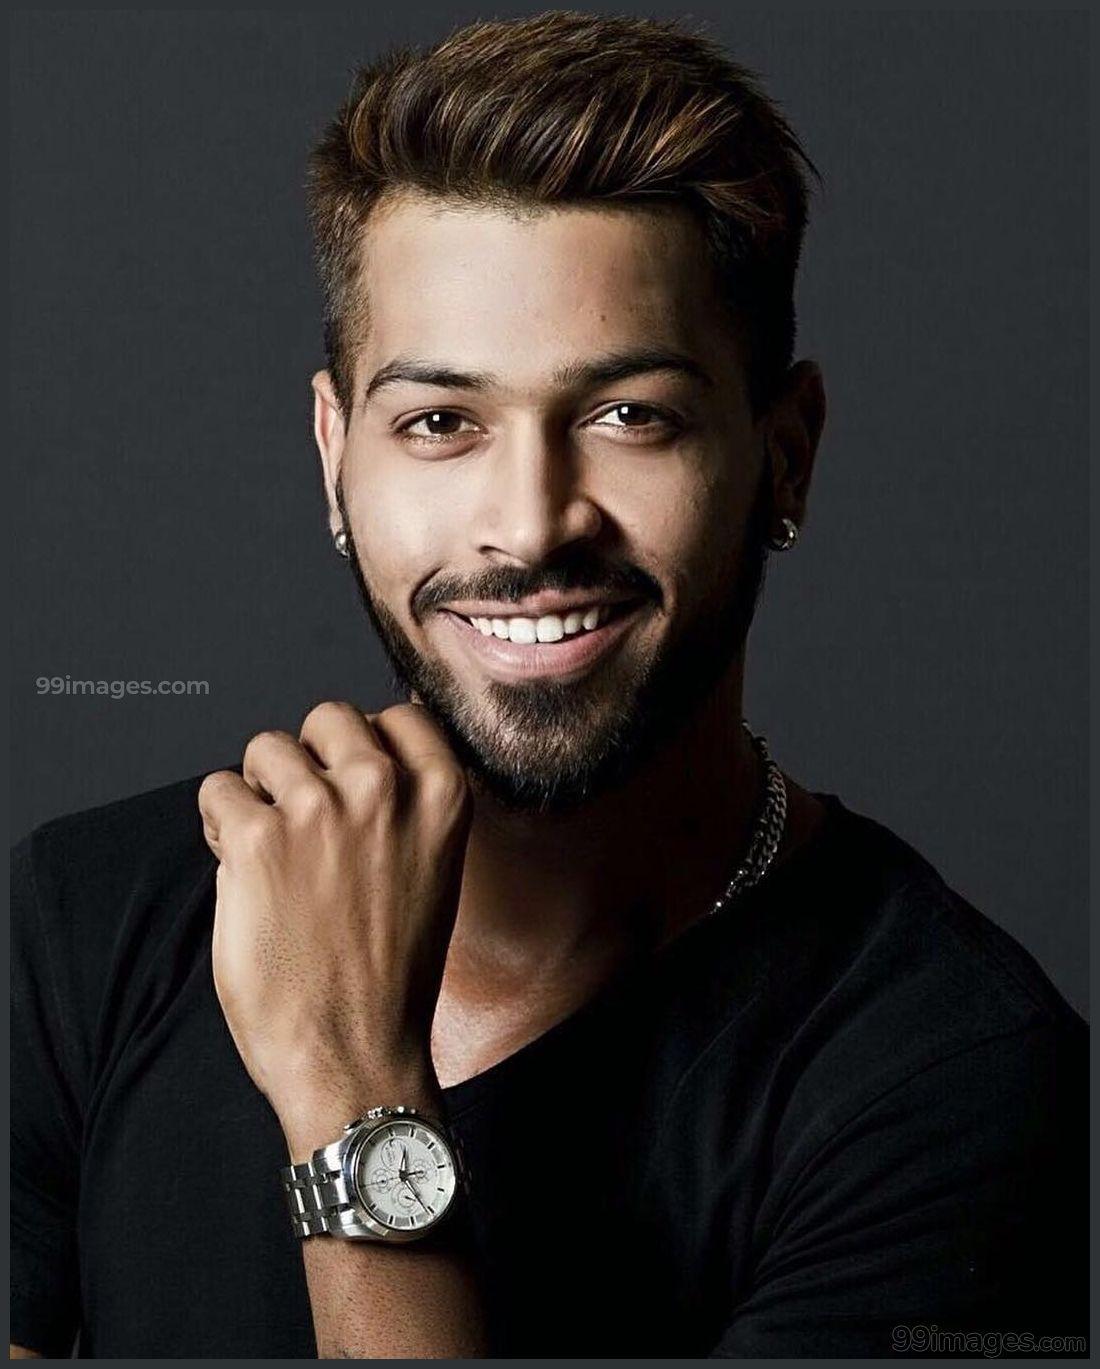 Hardik Pandya Photoshoot Images Hd Wallpapers 1080p 16294 Hardikpandya Cricketer Hdimages Hardikpandyata Stylish Hair Mens Hairstyles Boy Hairstyles